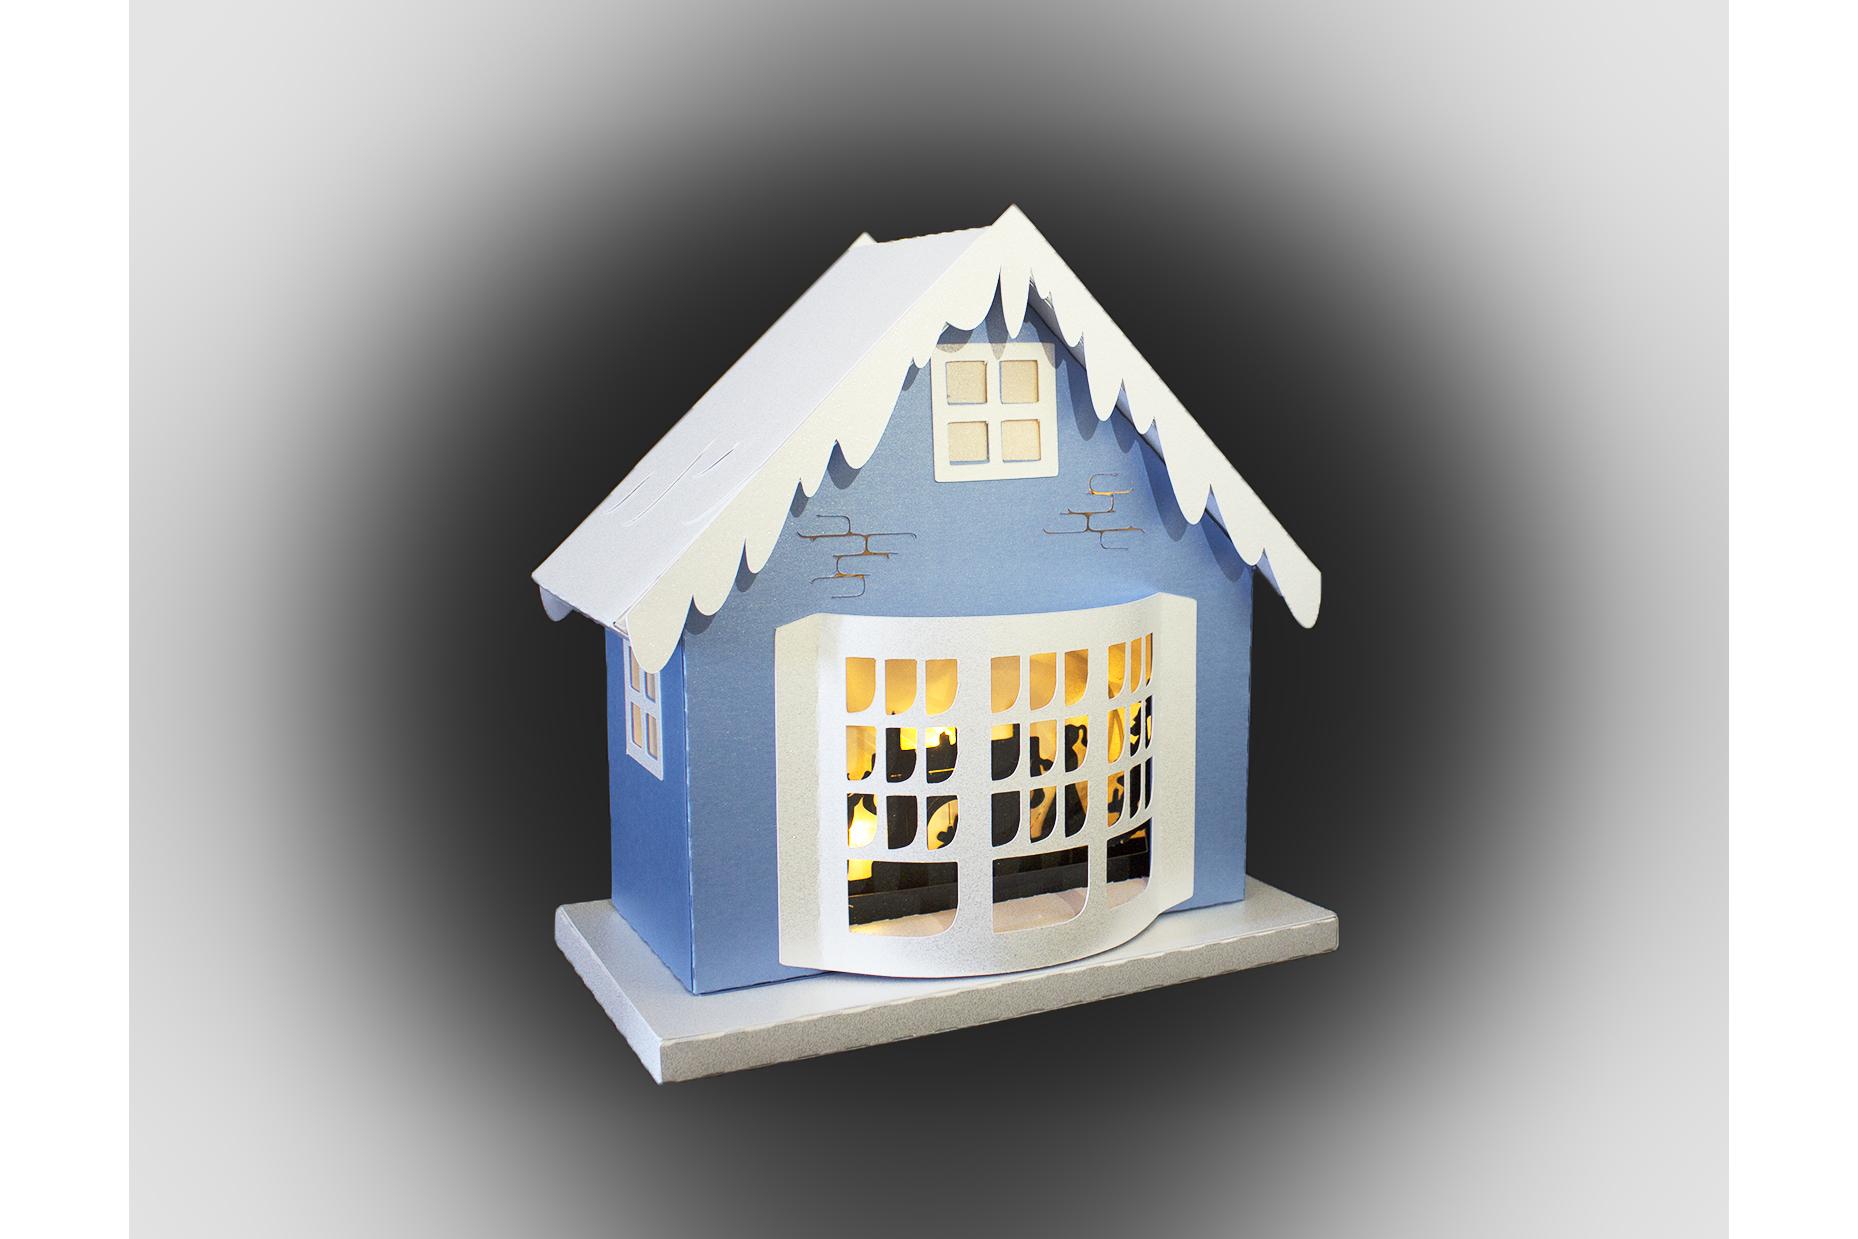 One more sleep Christmas house example image 3